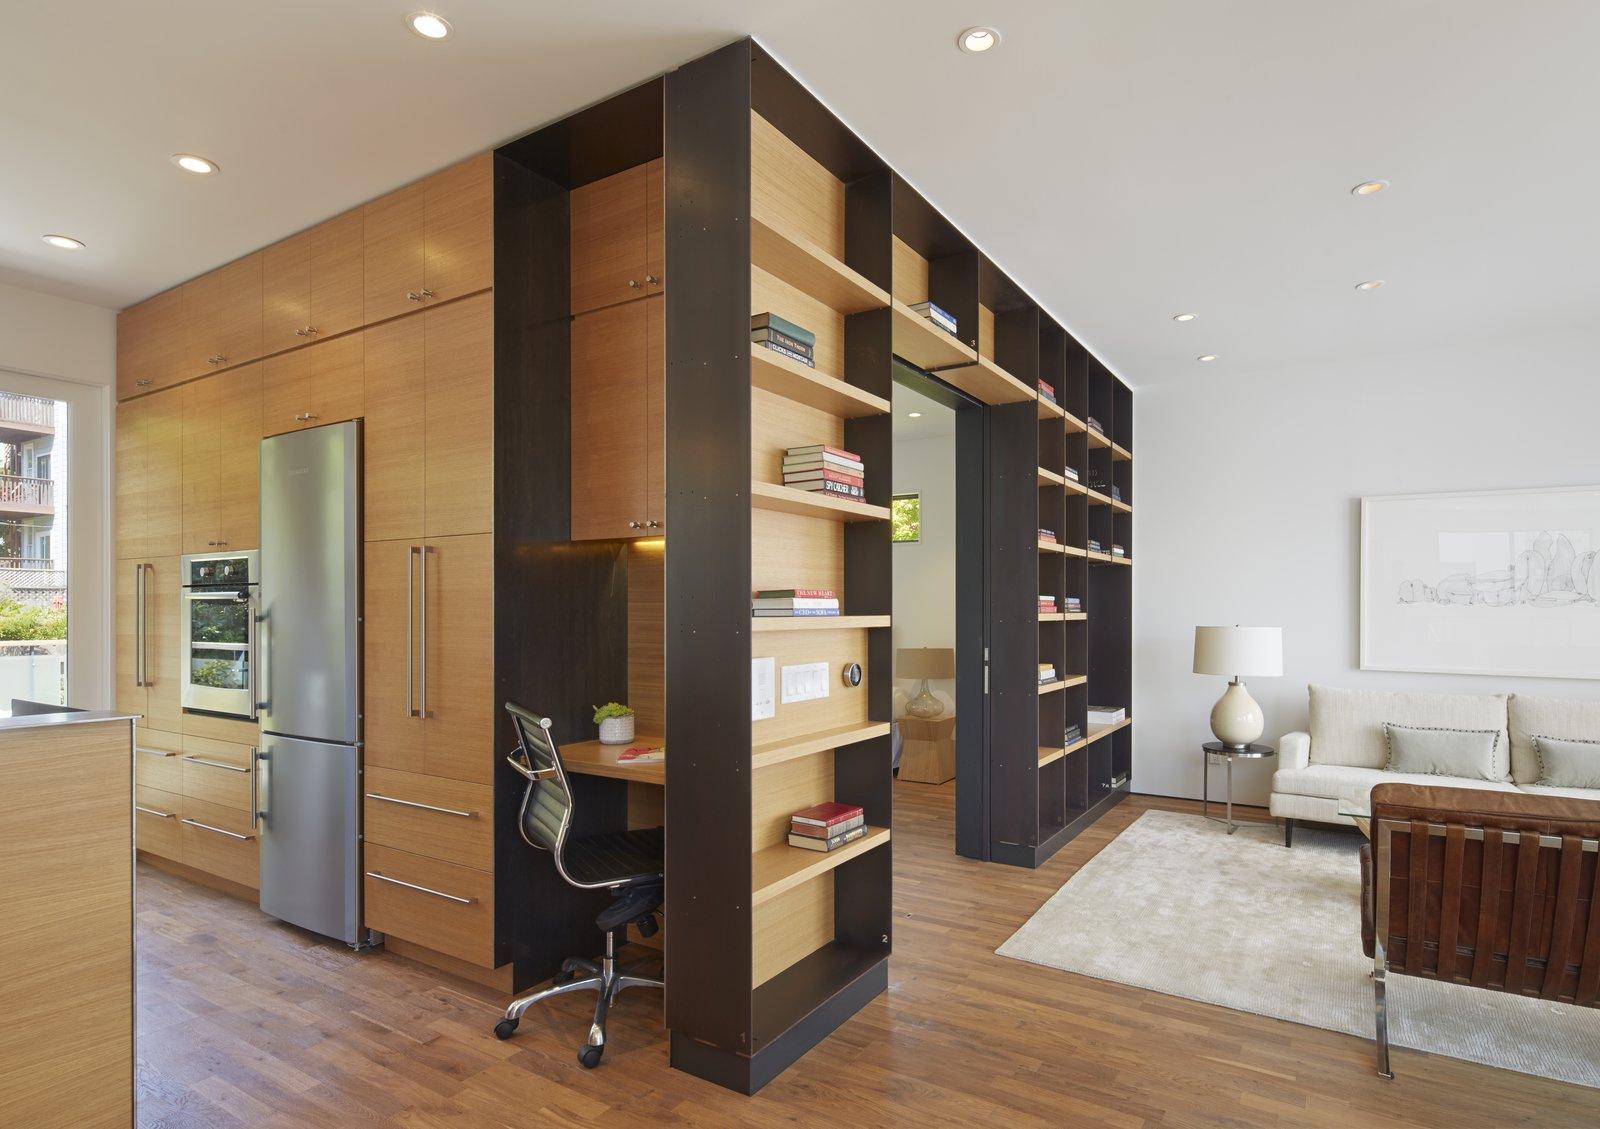 Tagged: Living Room, Ceiling Lighting, and Medium Hardwood Floor.  Best Photos from SteelHouse 1+2